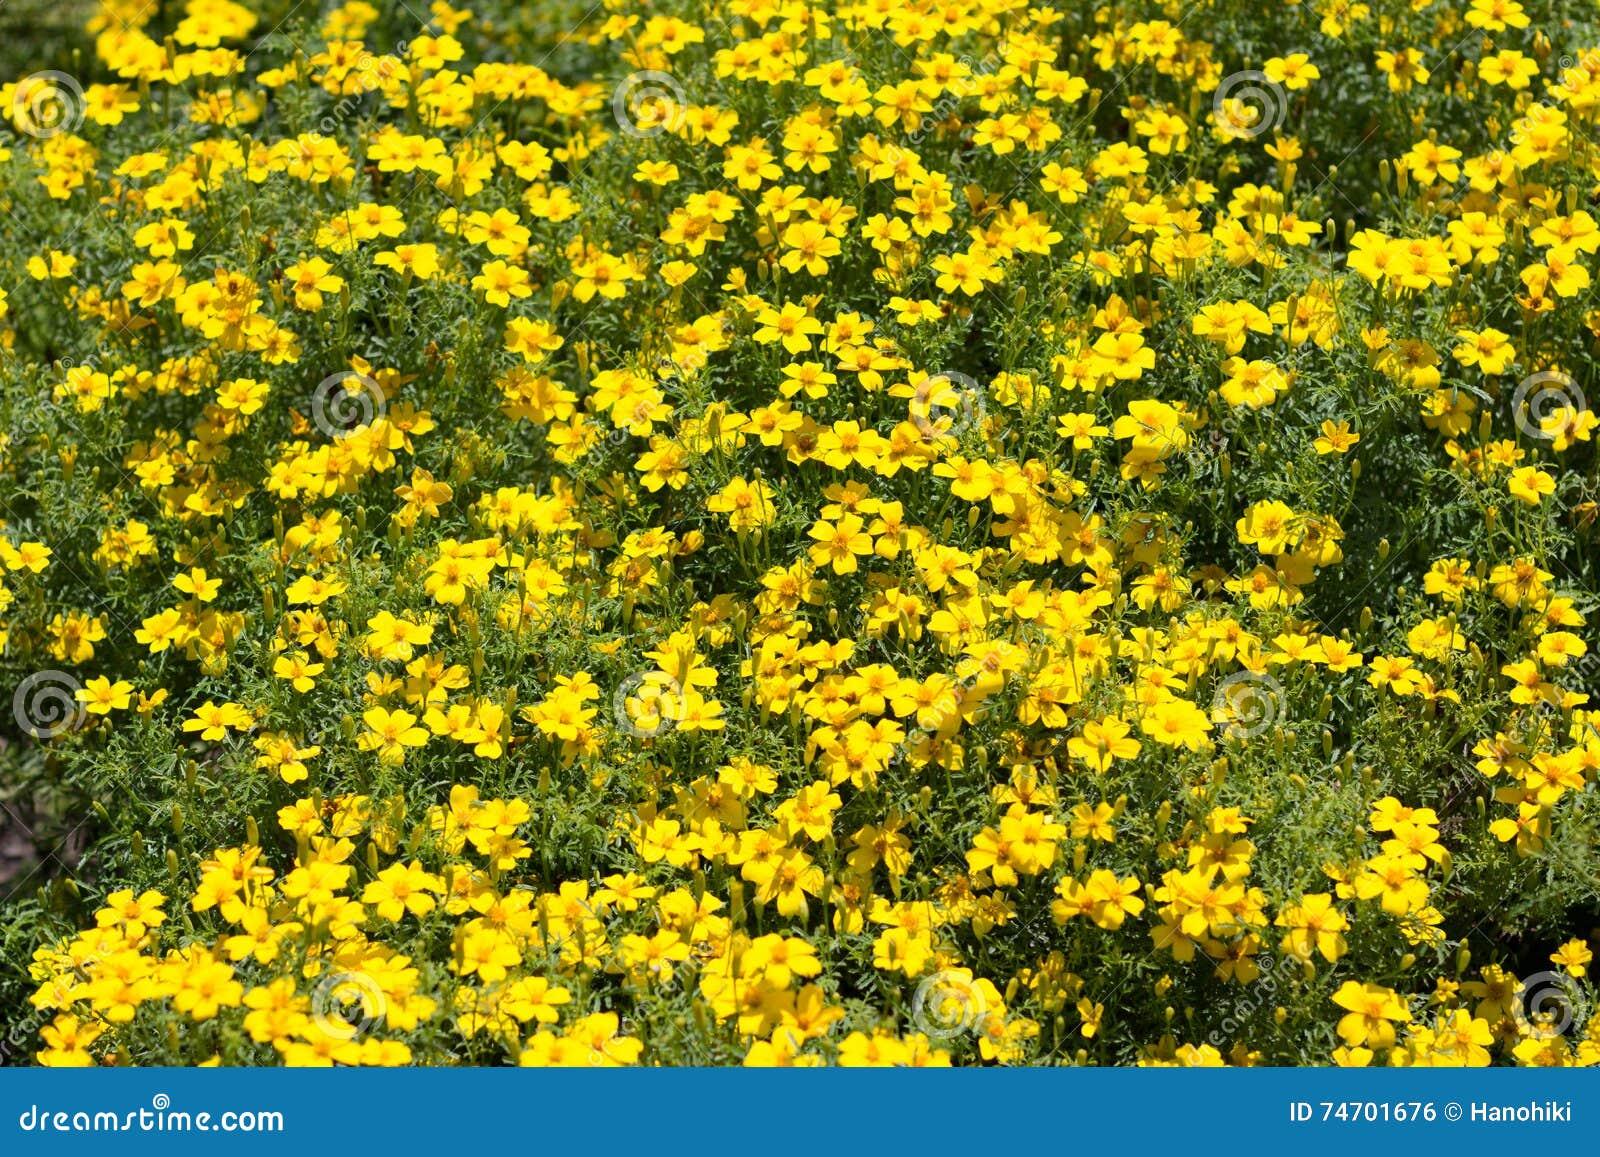 Yellow Flower Bush Many Yellow Spring Flowers Stock Photo